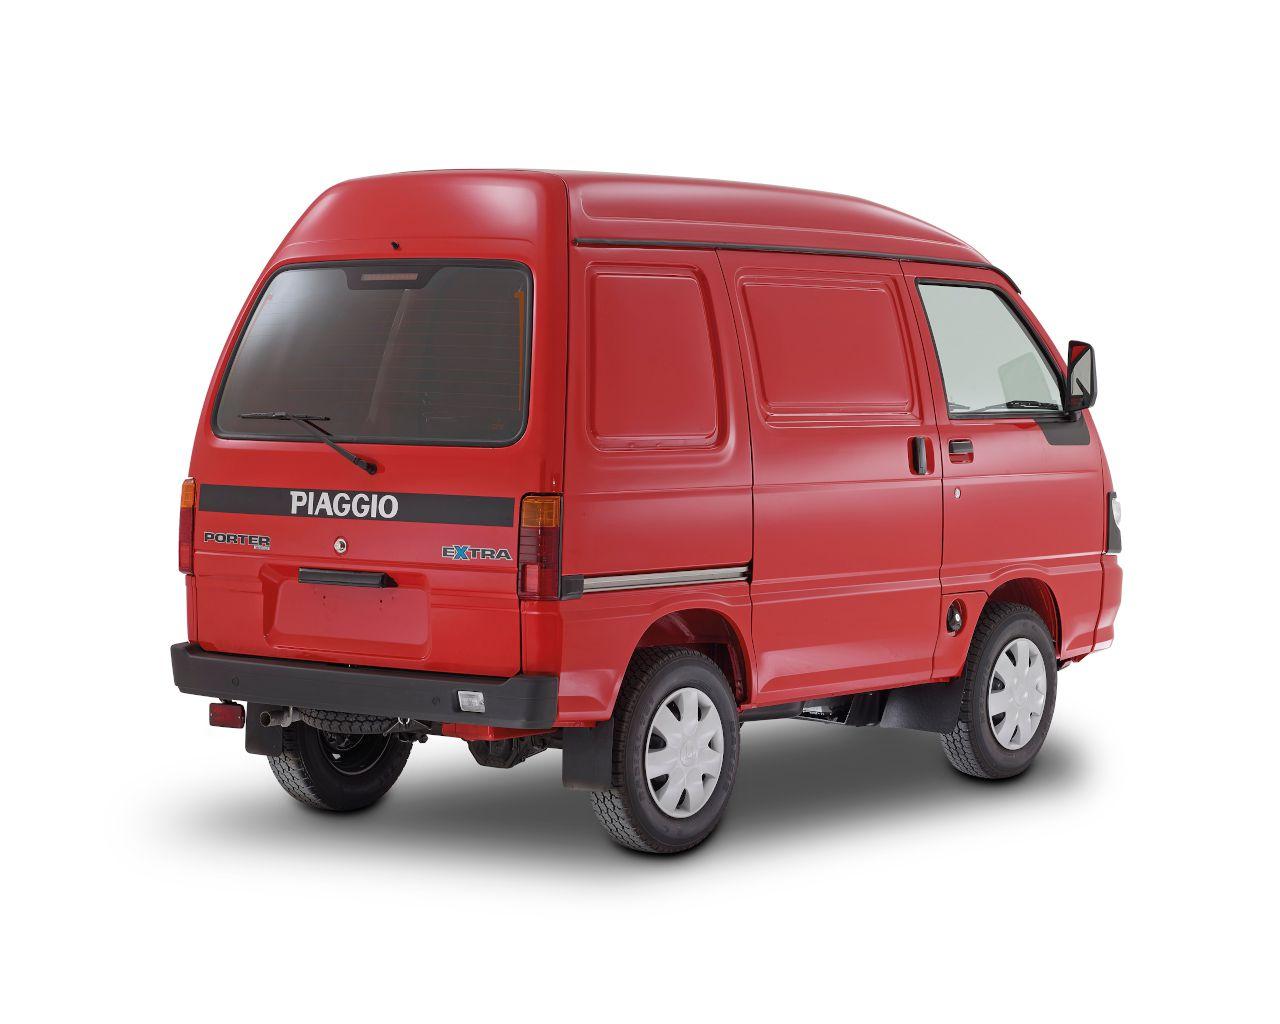 Piaggio Porter Κλειστού Τύπου Κόκκινο